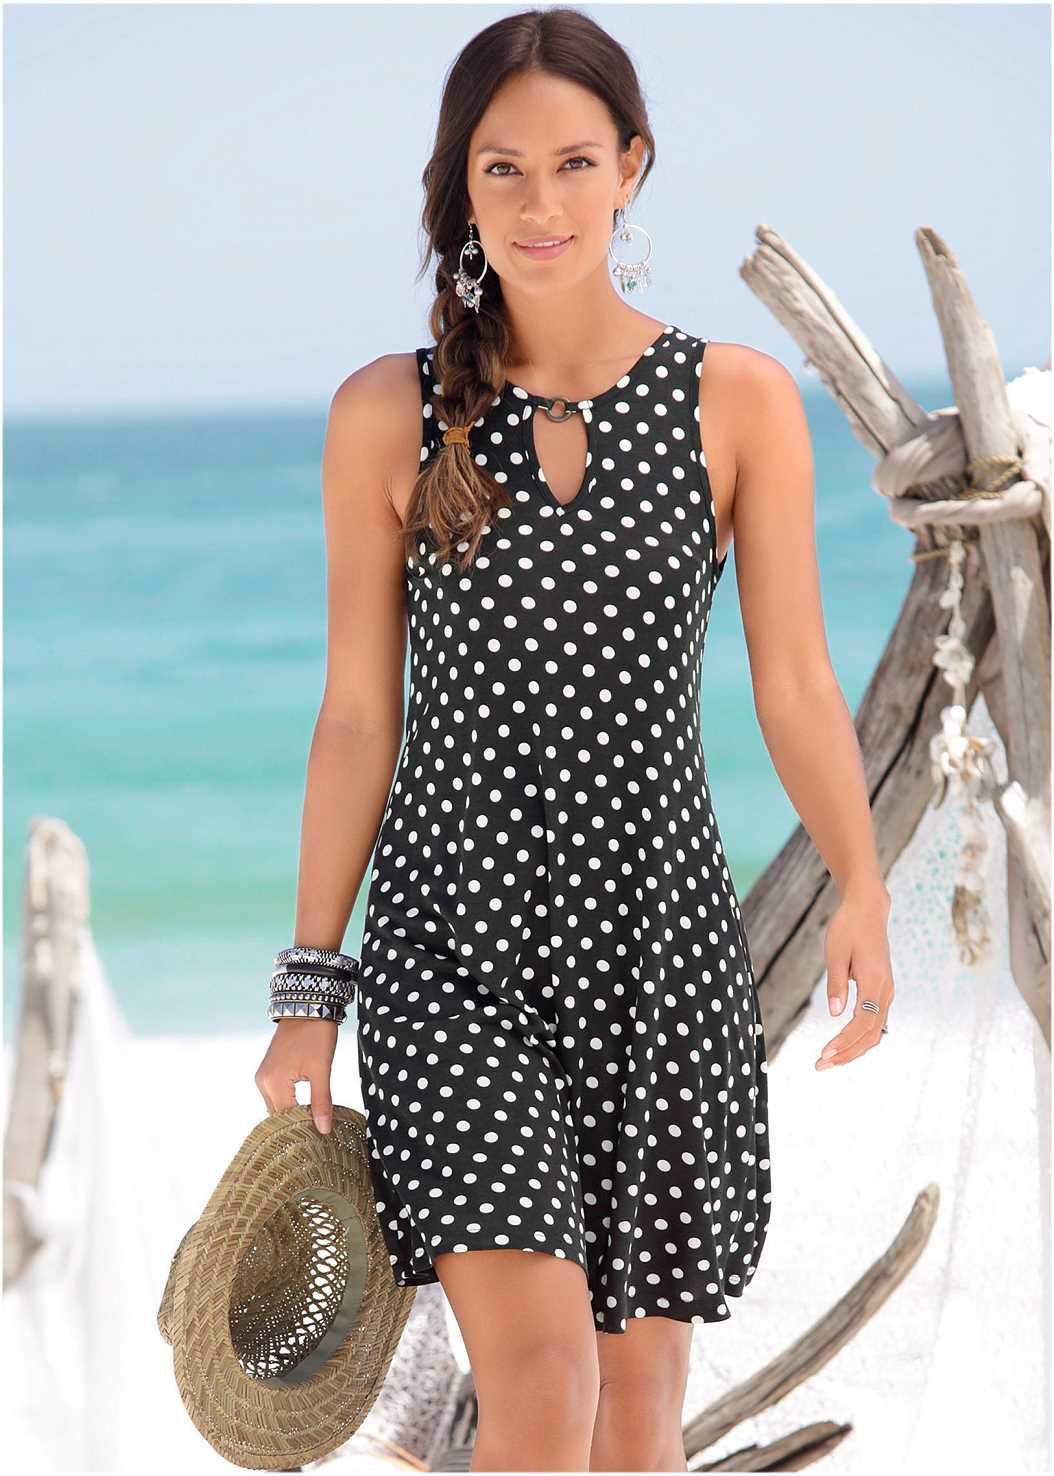 Polka Dot Casual Dress,Push Up Bra Buy 2 For $40